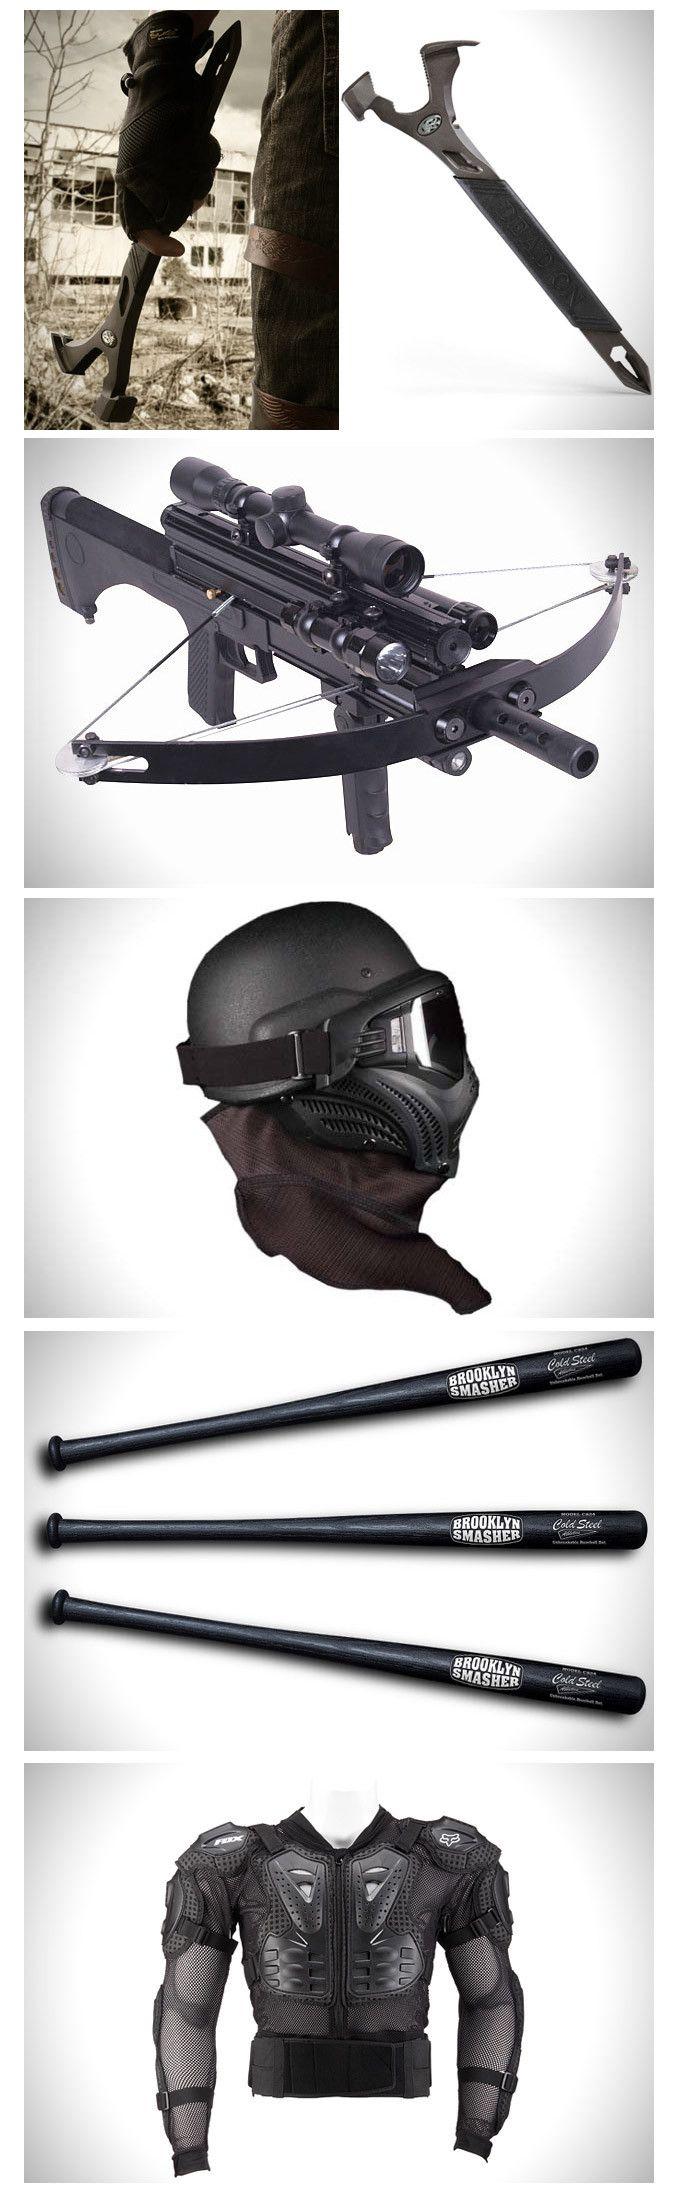 Zombie Weapons. [ Swordnarmory.com ] #Apocalypse #Zombies #swords